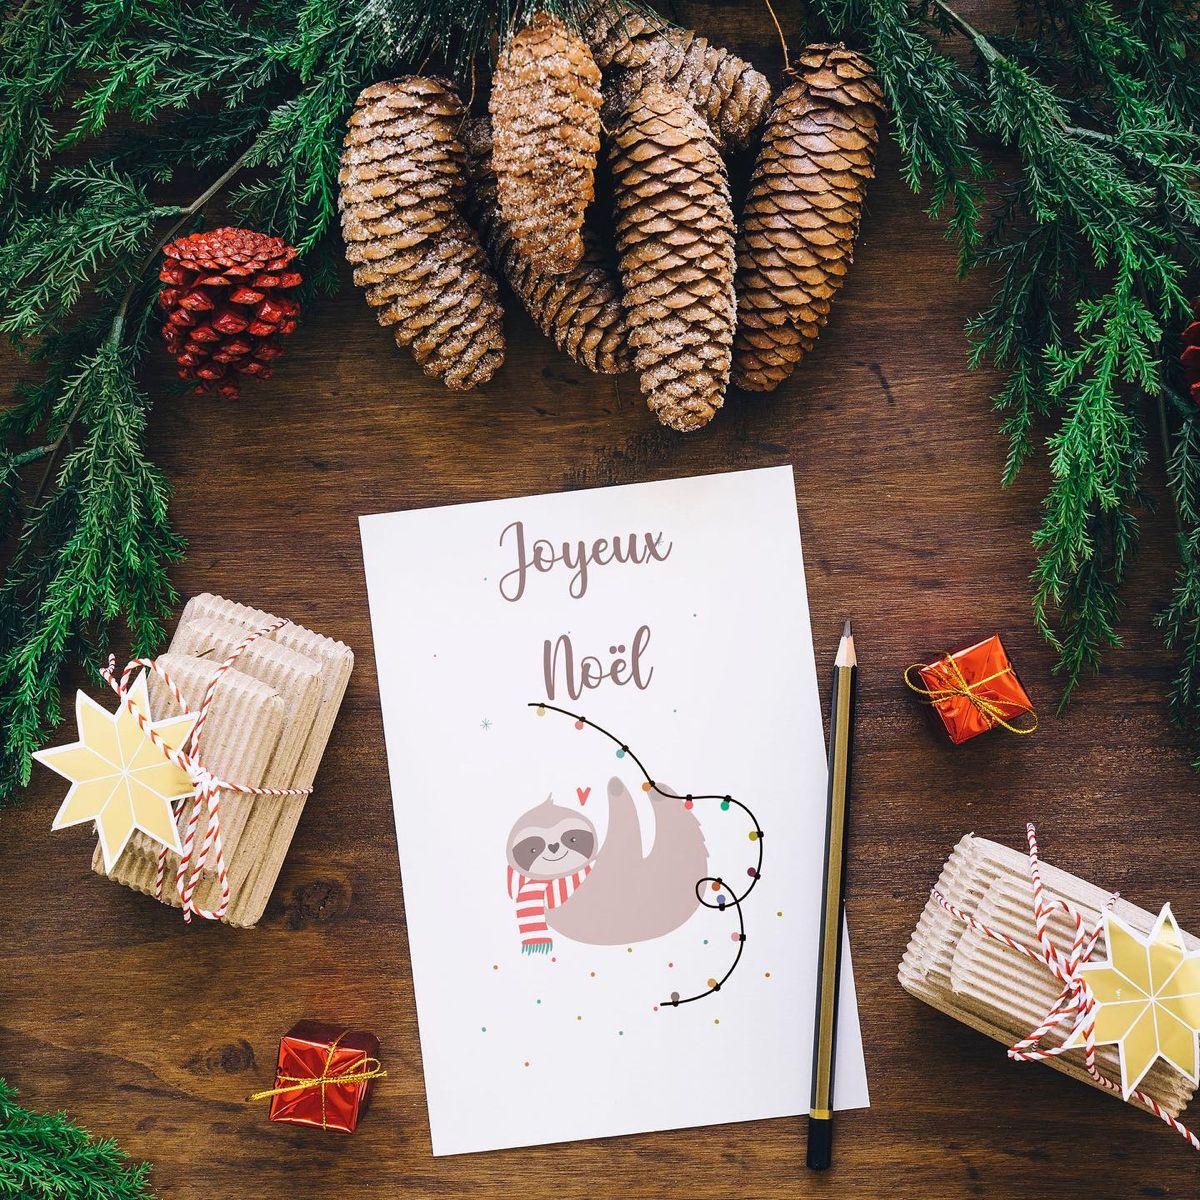 Joyeux Noel Carte Noel Christmas Card Holiday Greeting Etsy Noel Christmas Cards Holiday Cards Christmas Cards